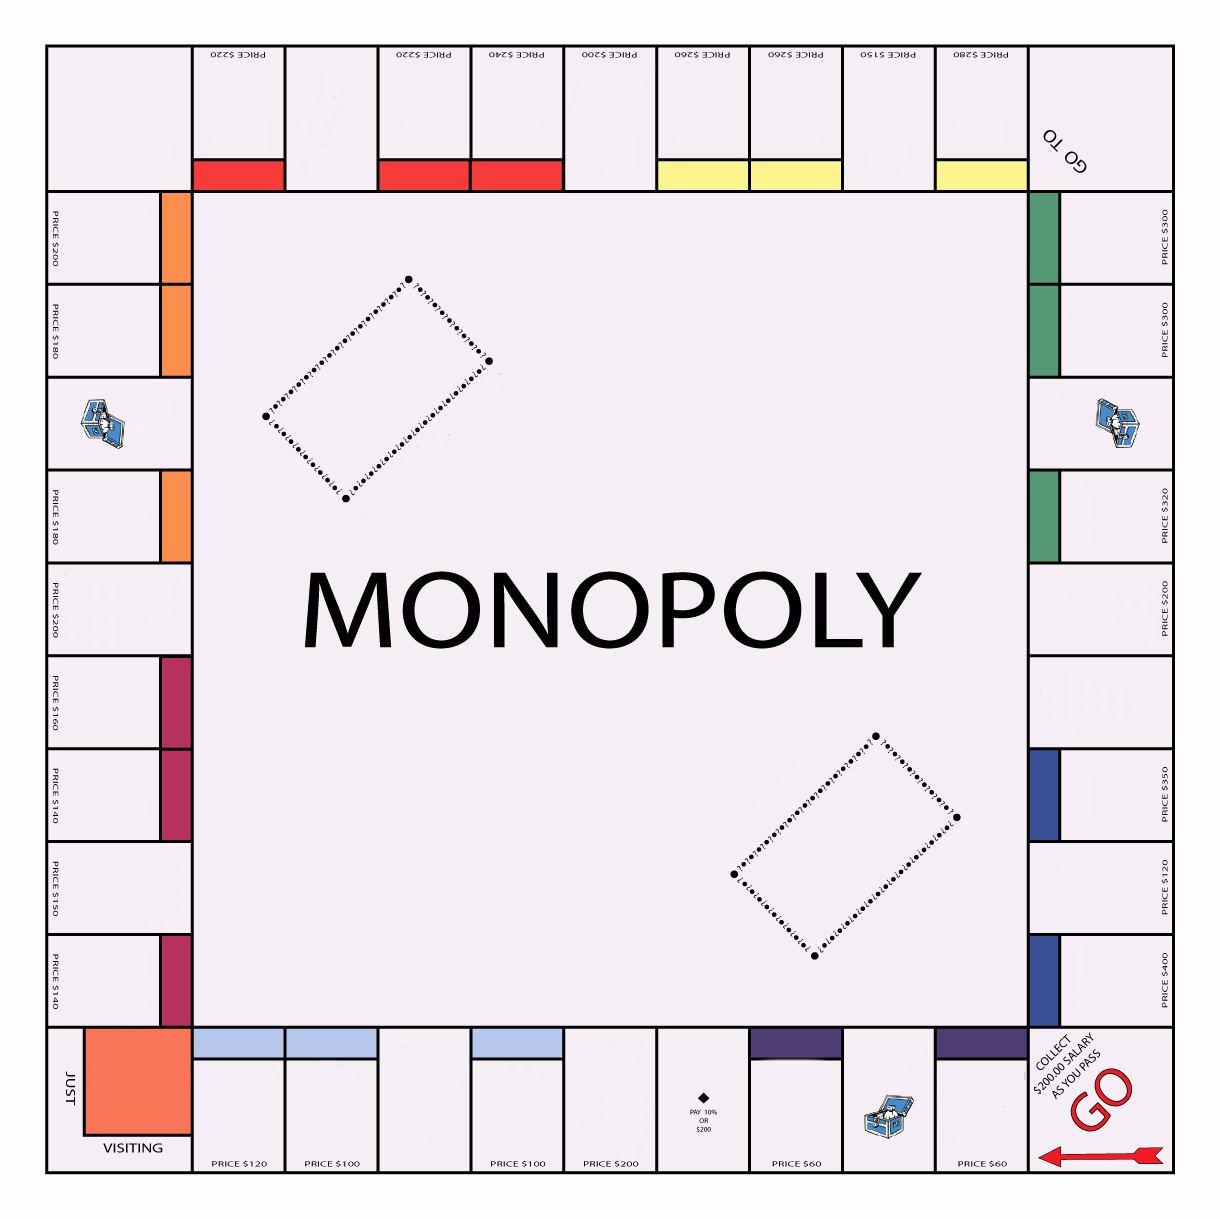 Monopoly Game Template Unique Economic Development News for Sun Prairie Wisconsin